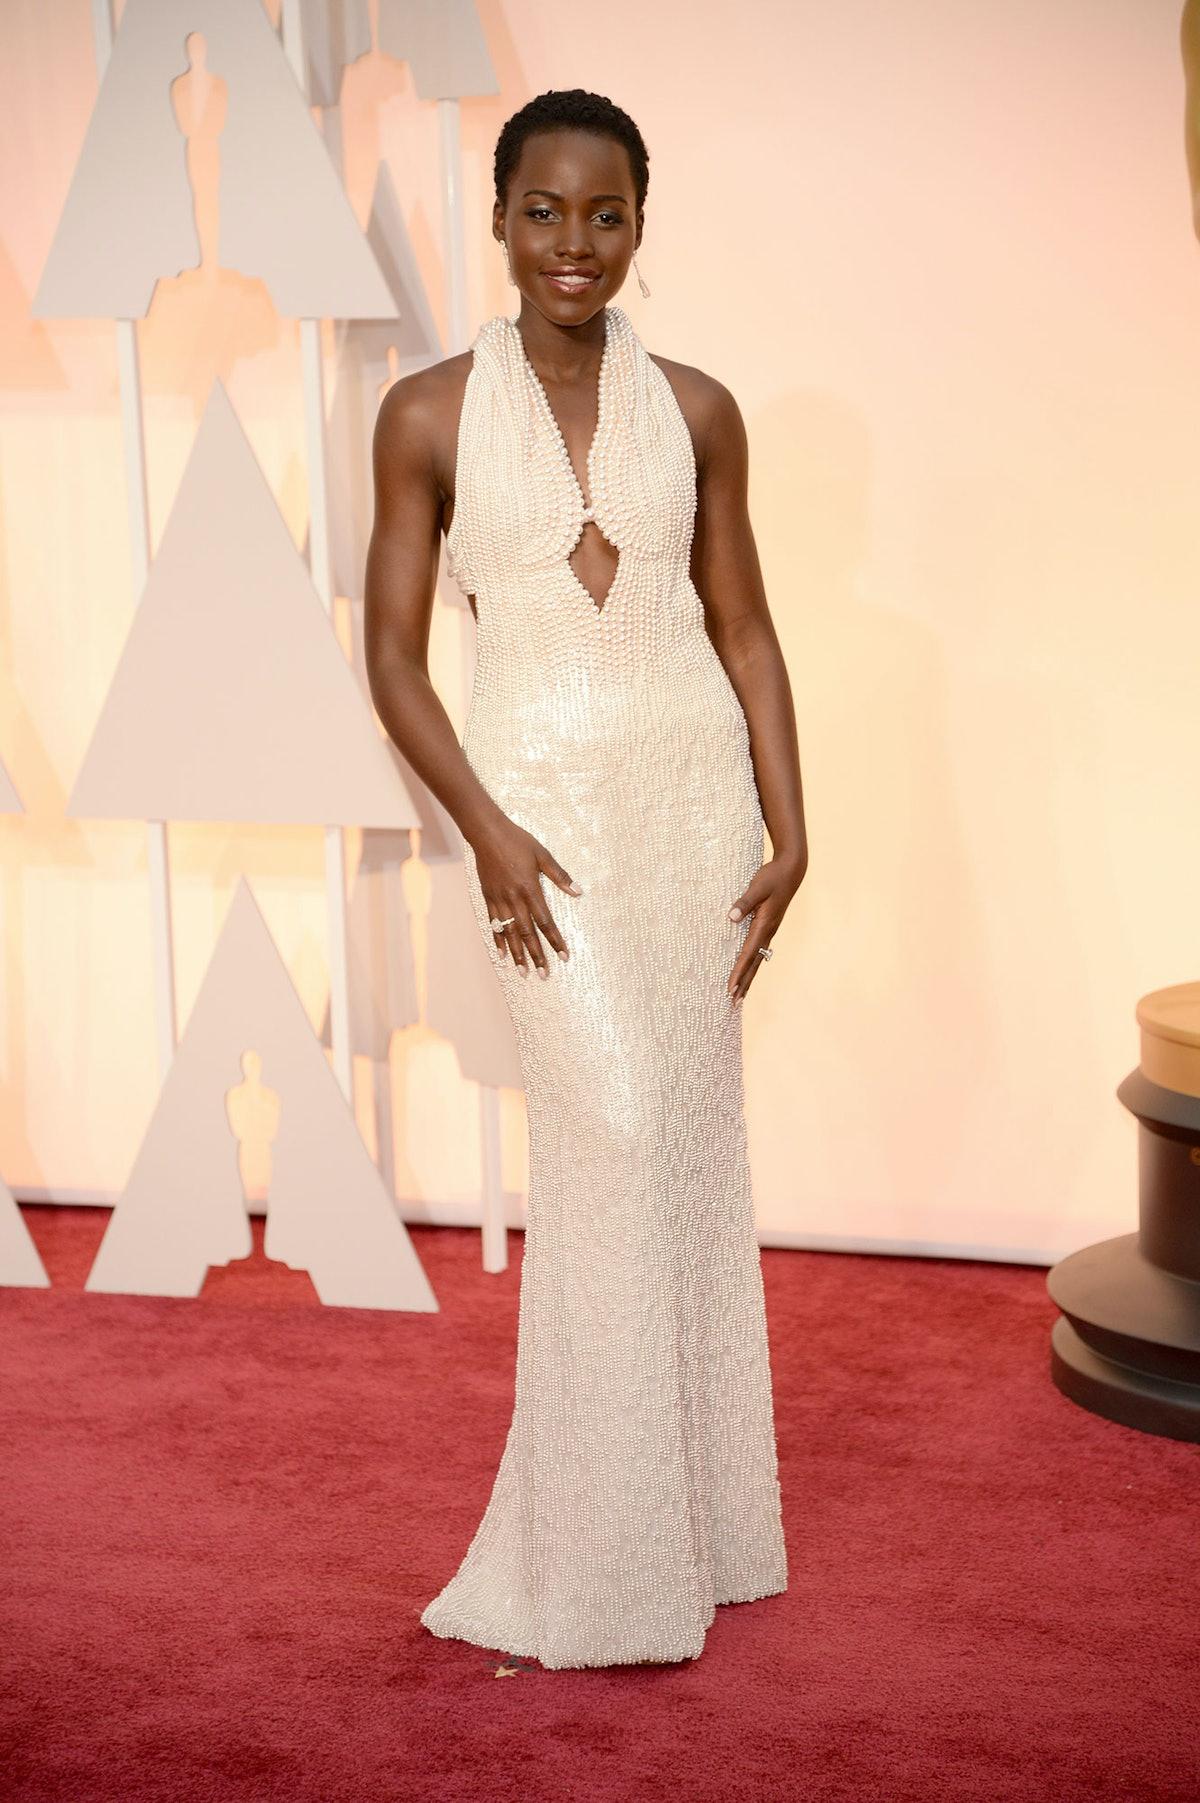 Lupita Nyong'o in Calvin Klein Collection at the Oscars